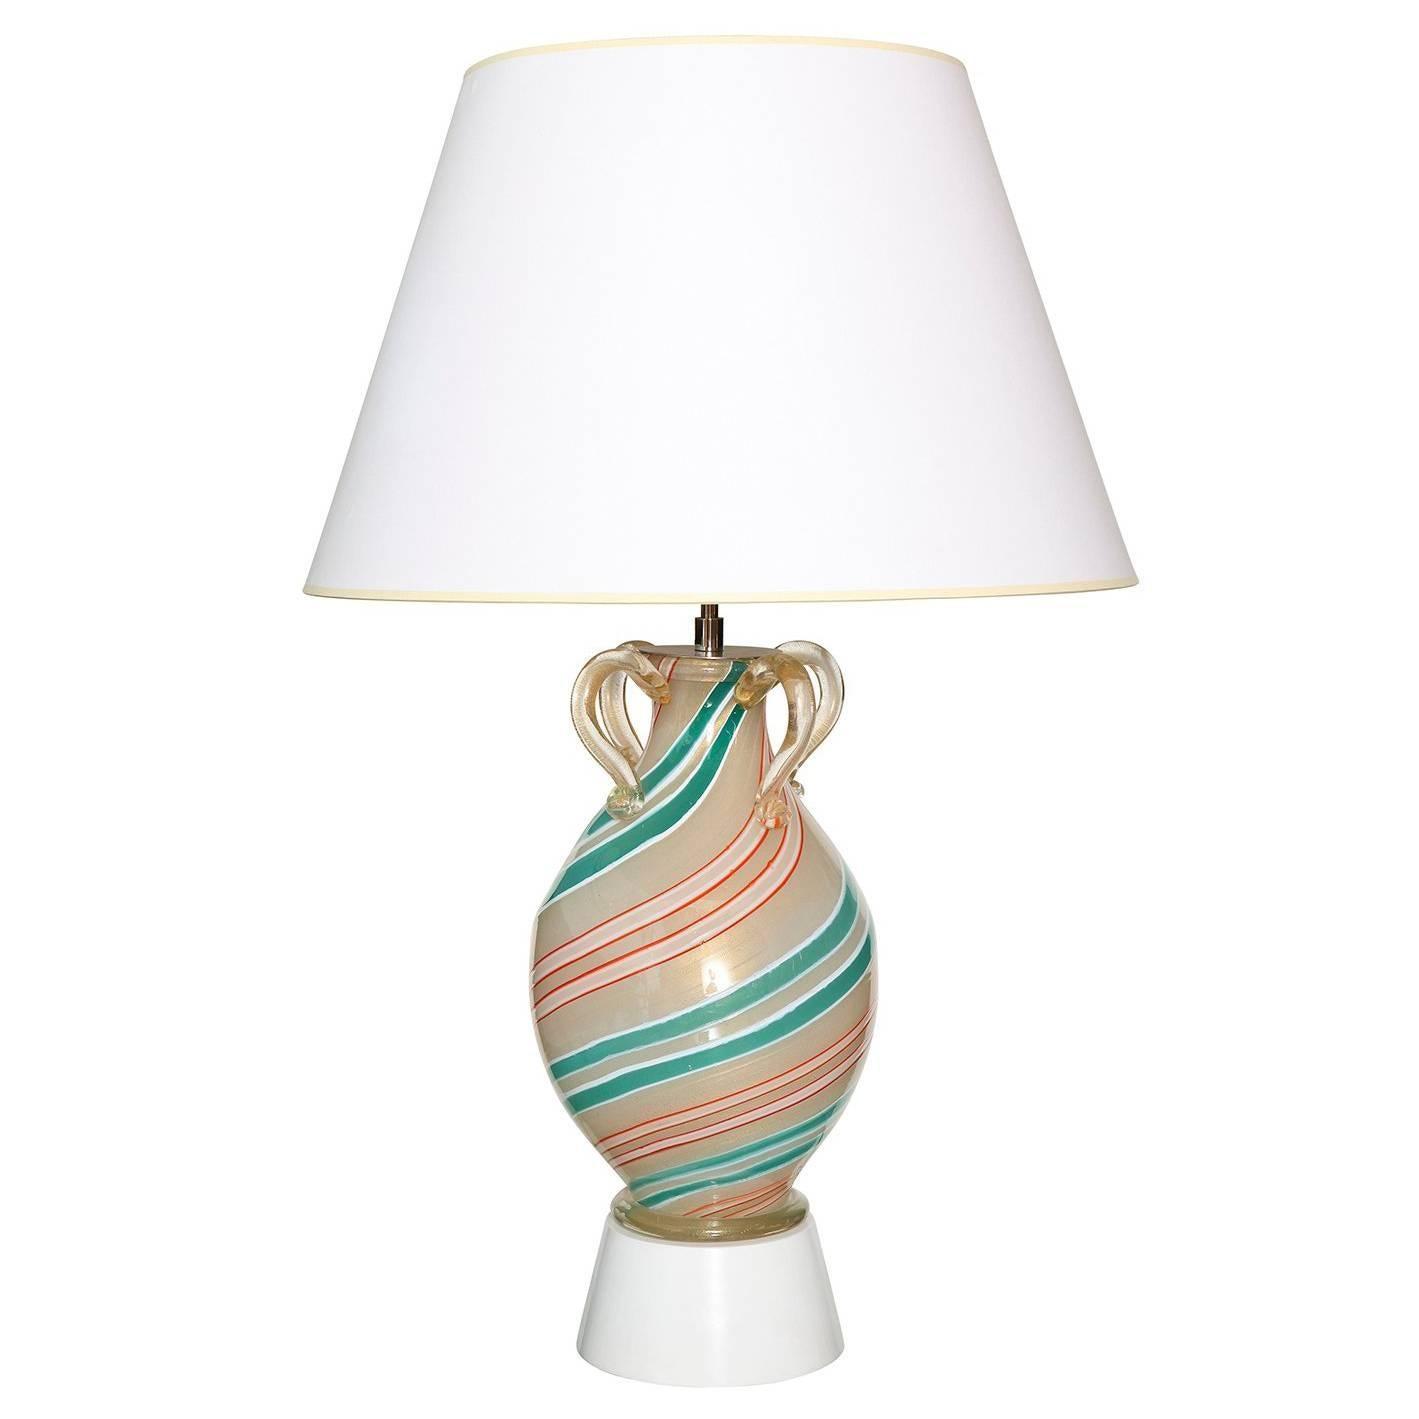 Handblown Glass Lamp by Barovier